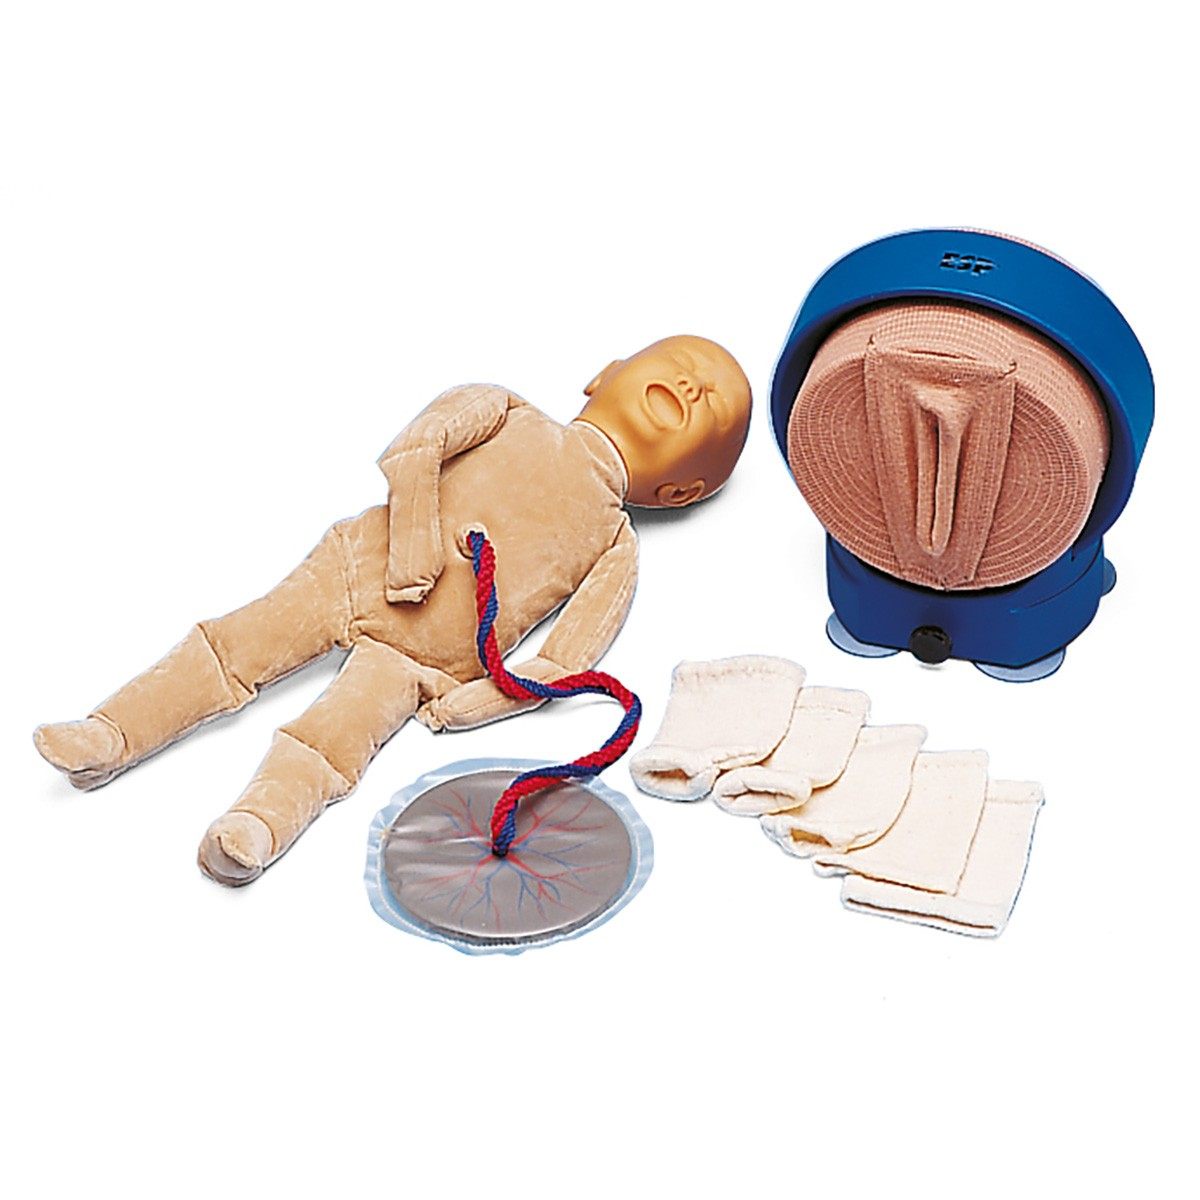 Geburtssimulator, 7-teilig